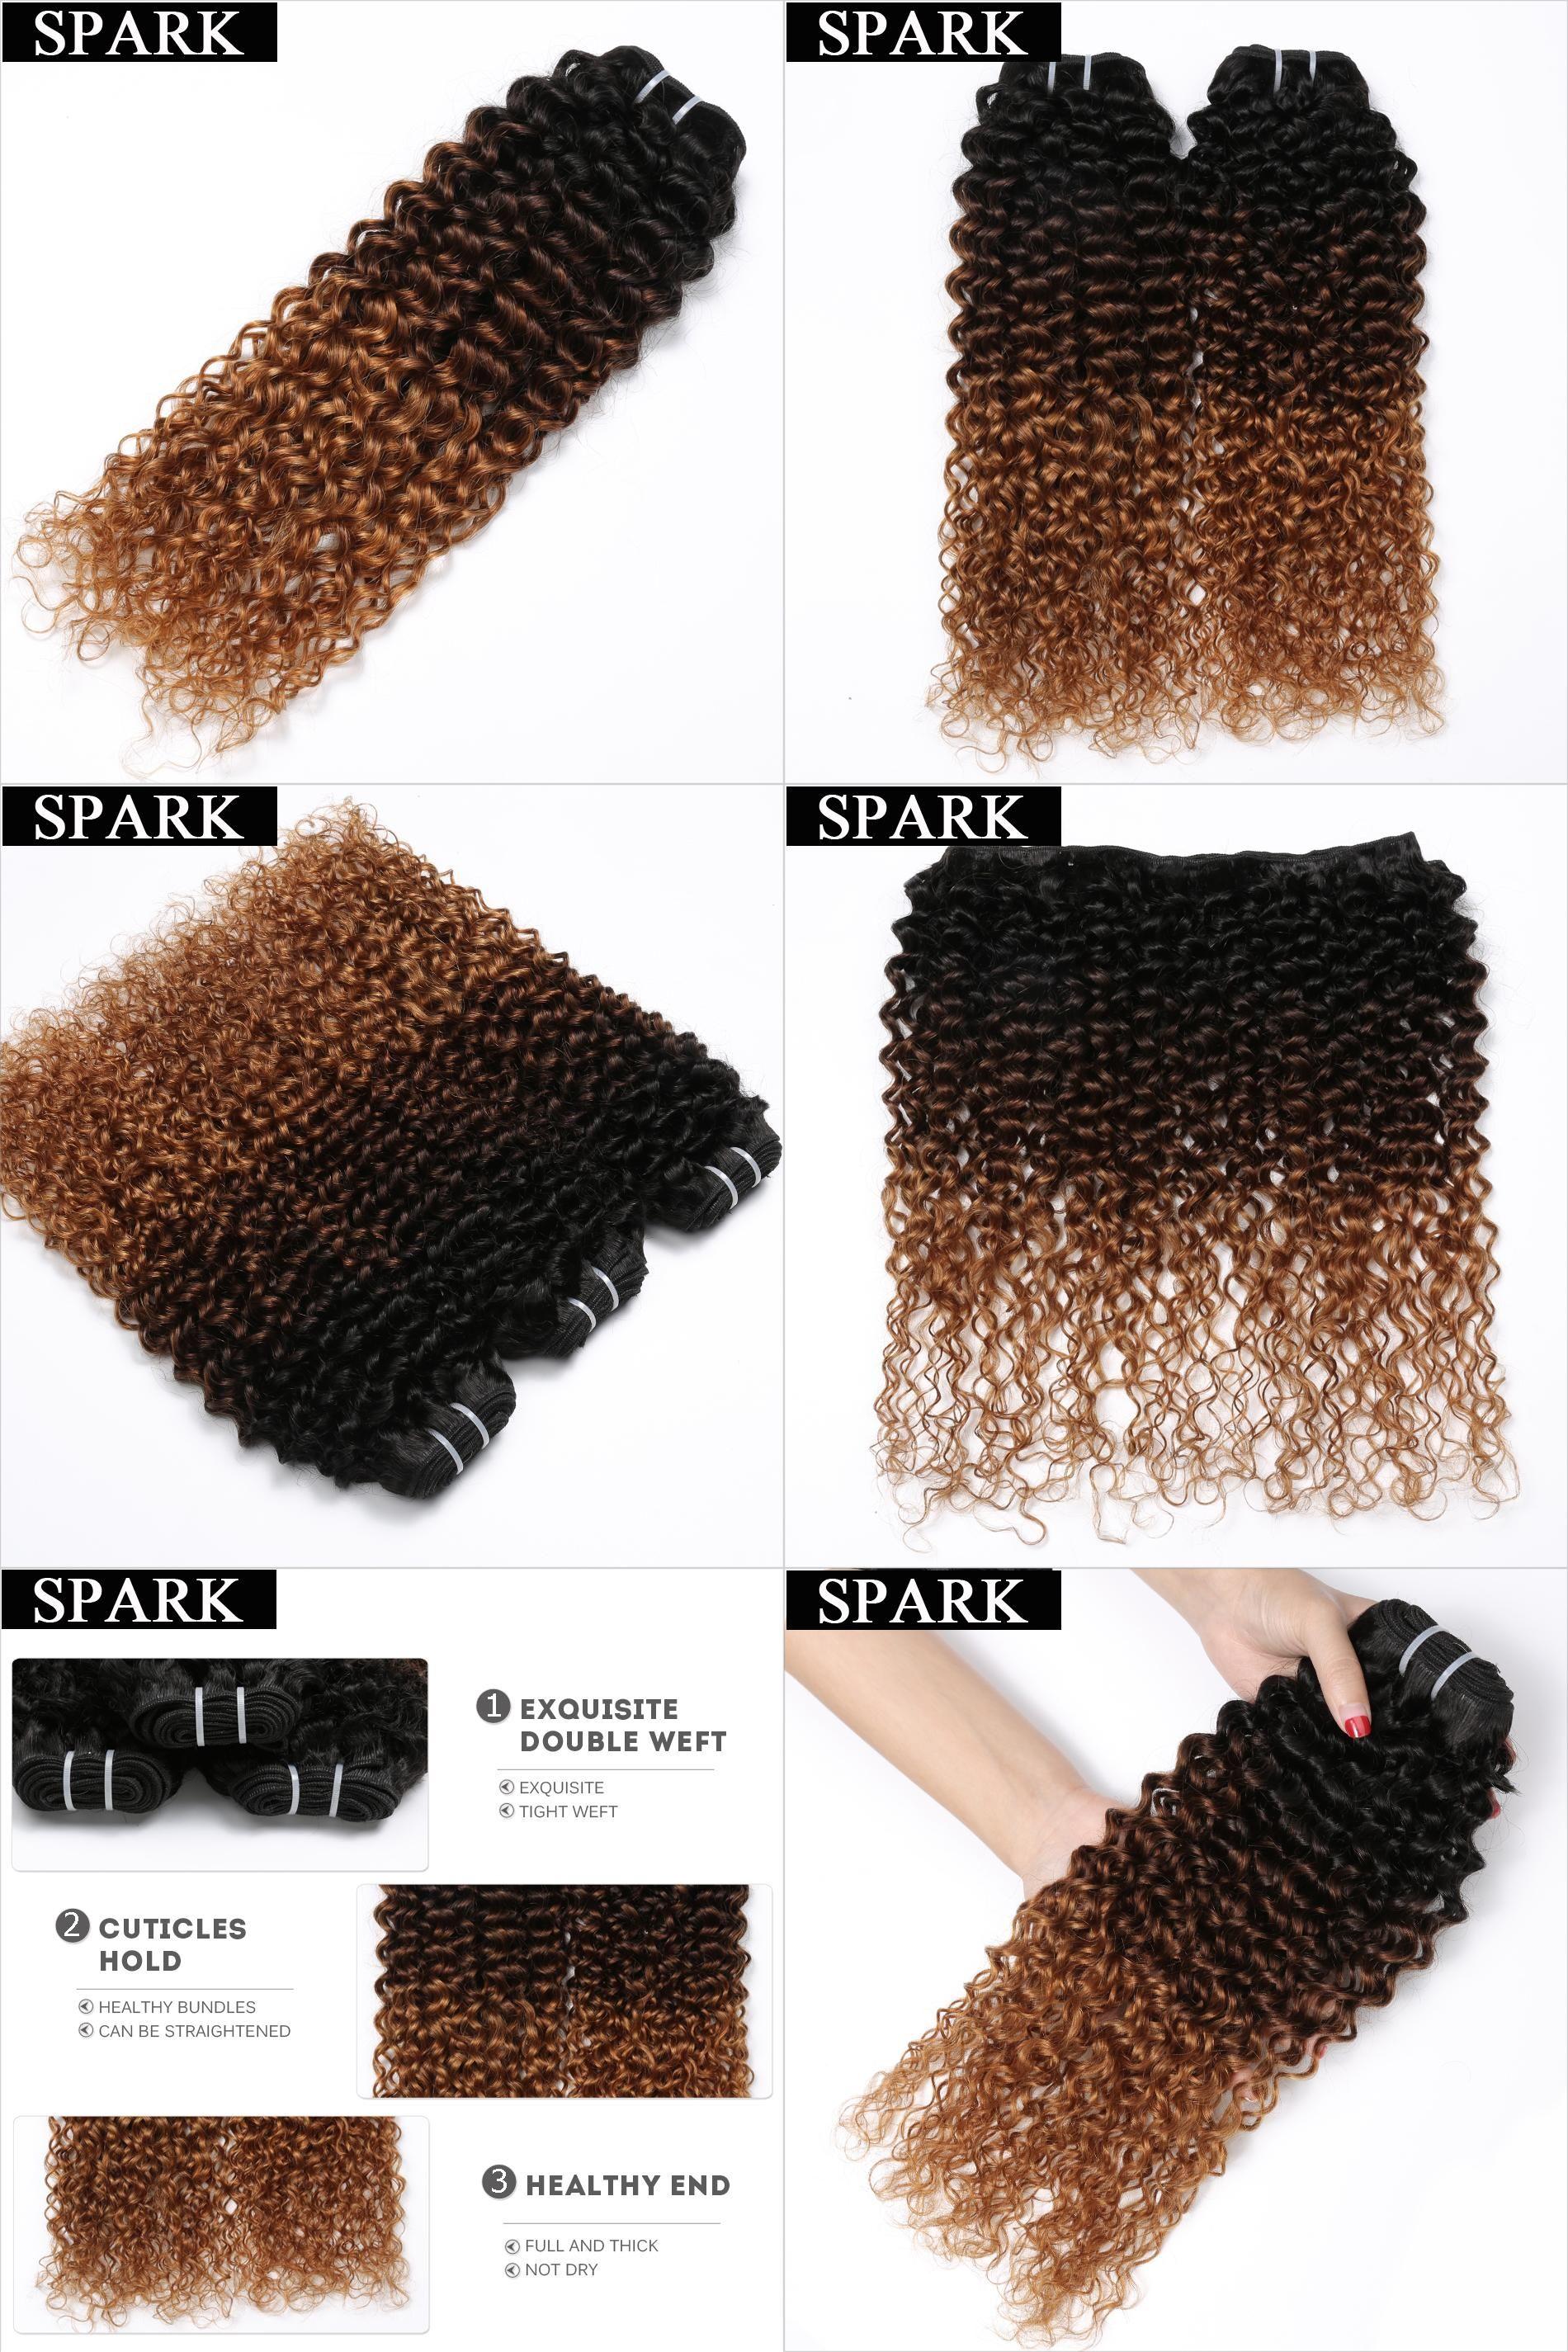 Visit To Buy Spark Remy Hair 3 Tone Ombre Brazilian Hair Bundles